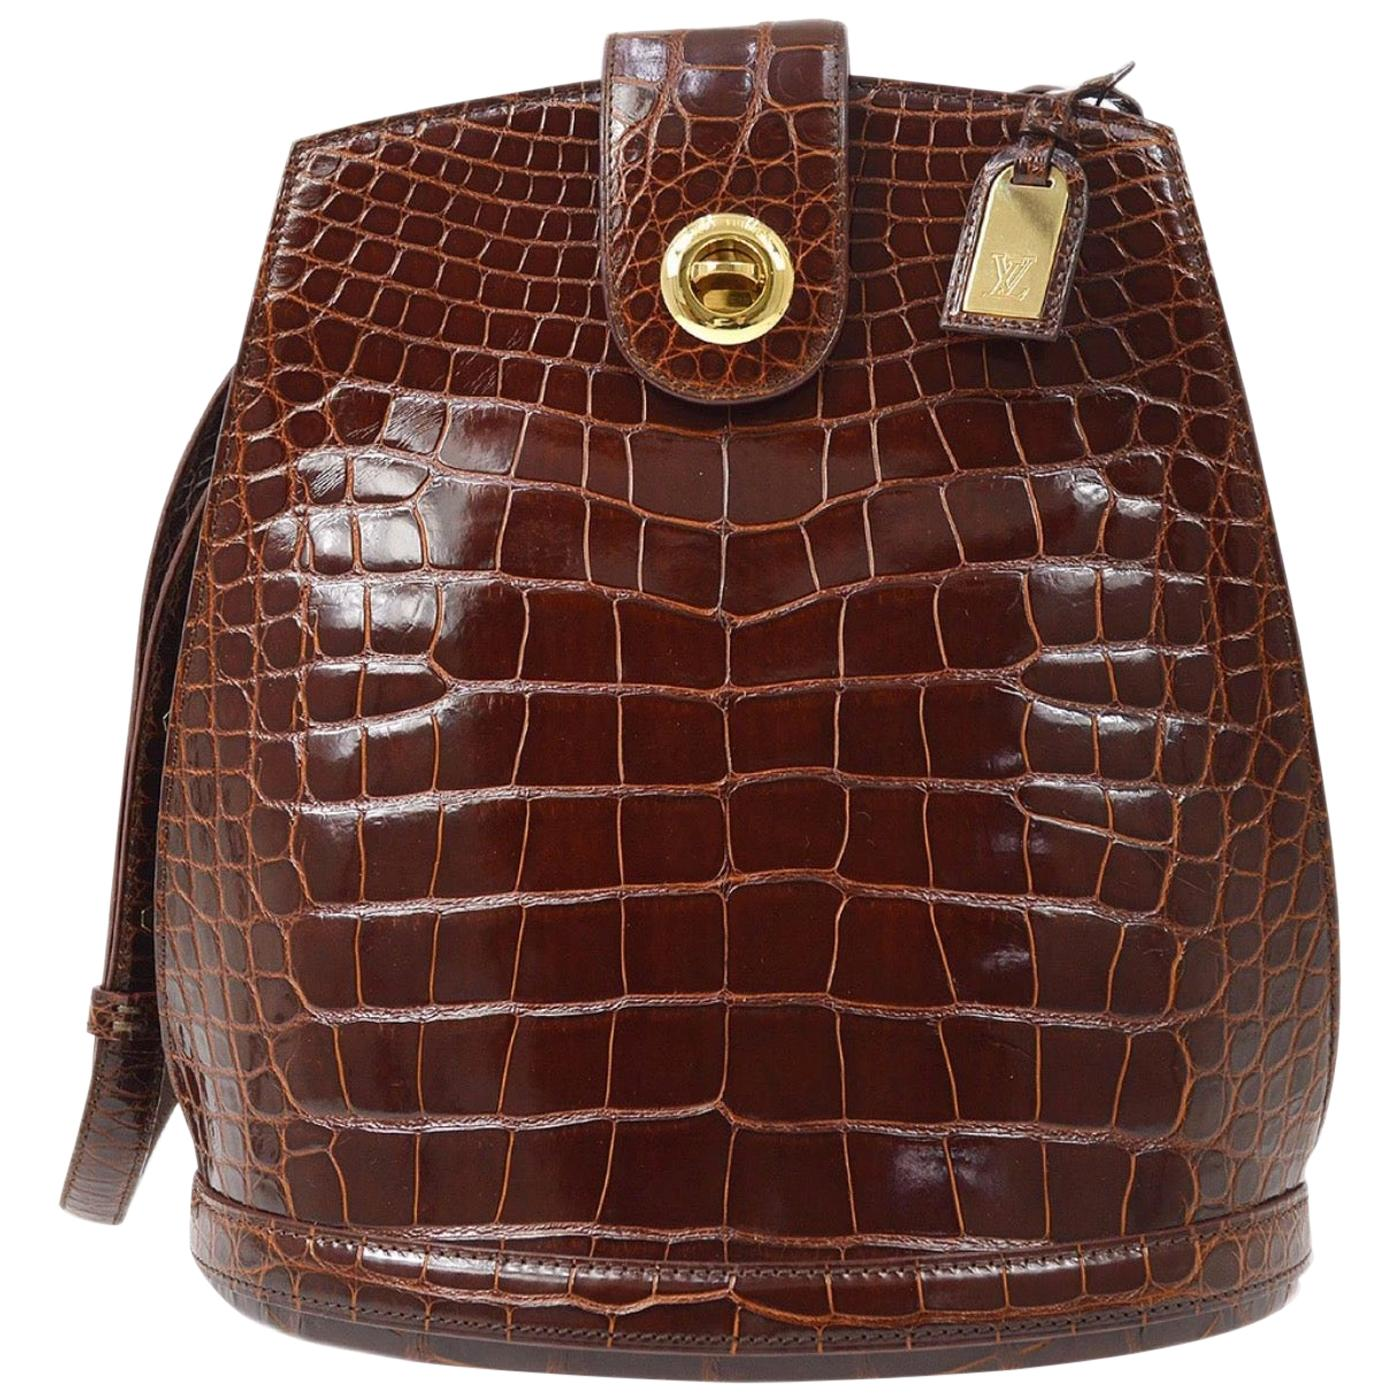 Louis Vuitton Brown Crocodile Leather Exotic Top Handle Shoulder Bucket Bag